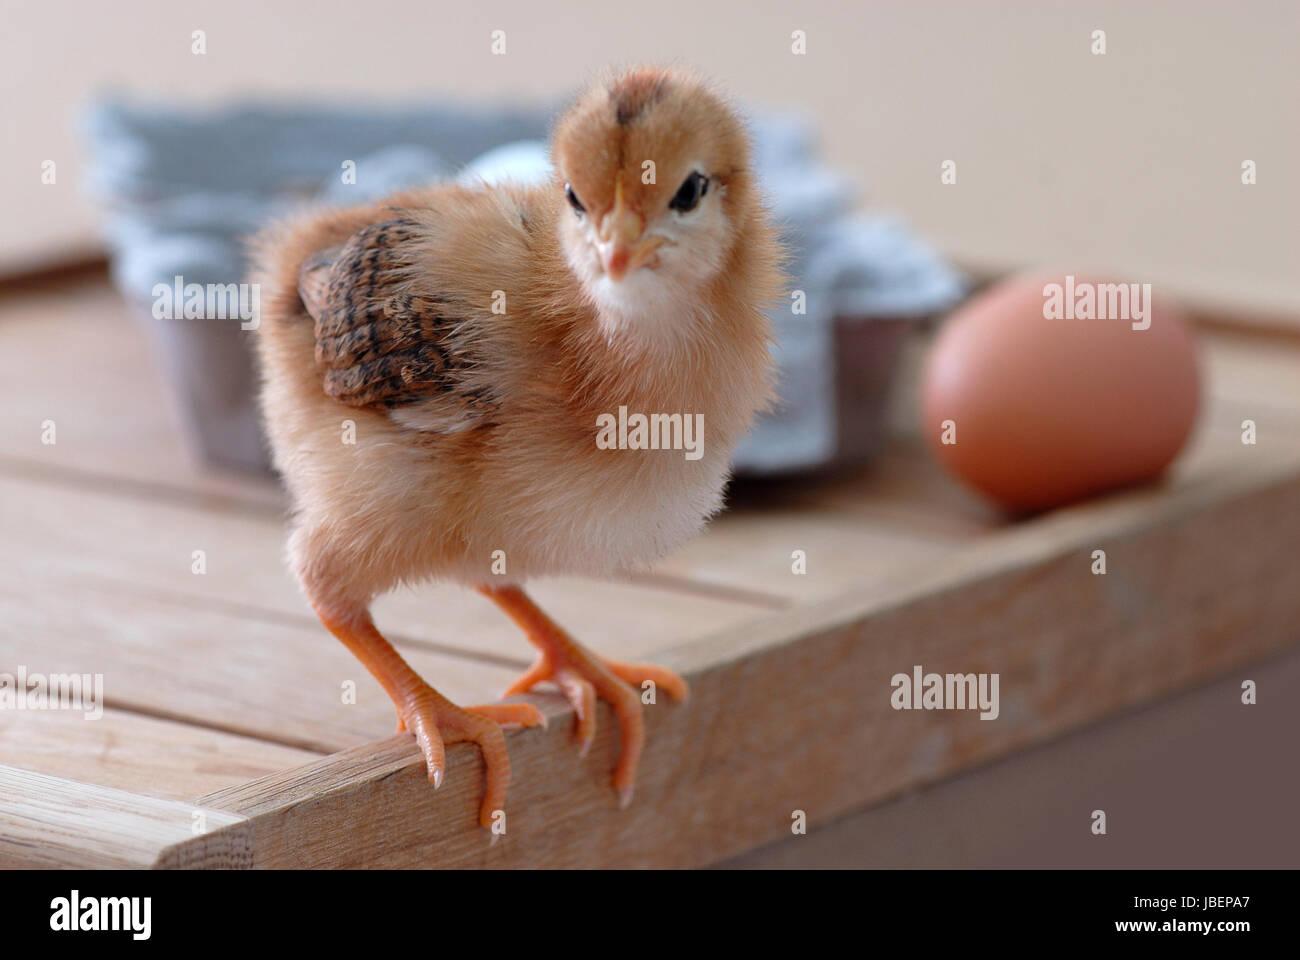 Pusteblume [#Beginning of Shooting Data Section] Nikon D200 2014/03/15 14:31:22.49 Zeitzone/Datum: RAW (12 Bit) - Stock Image